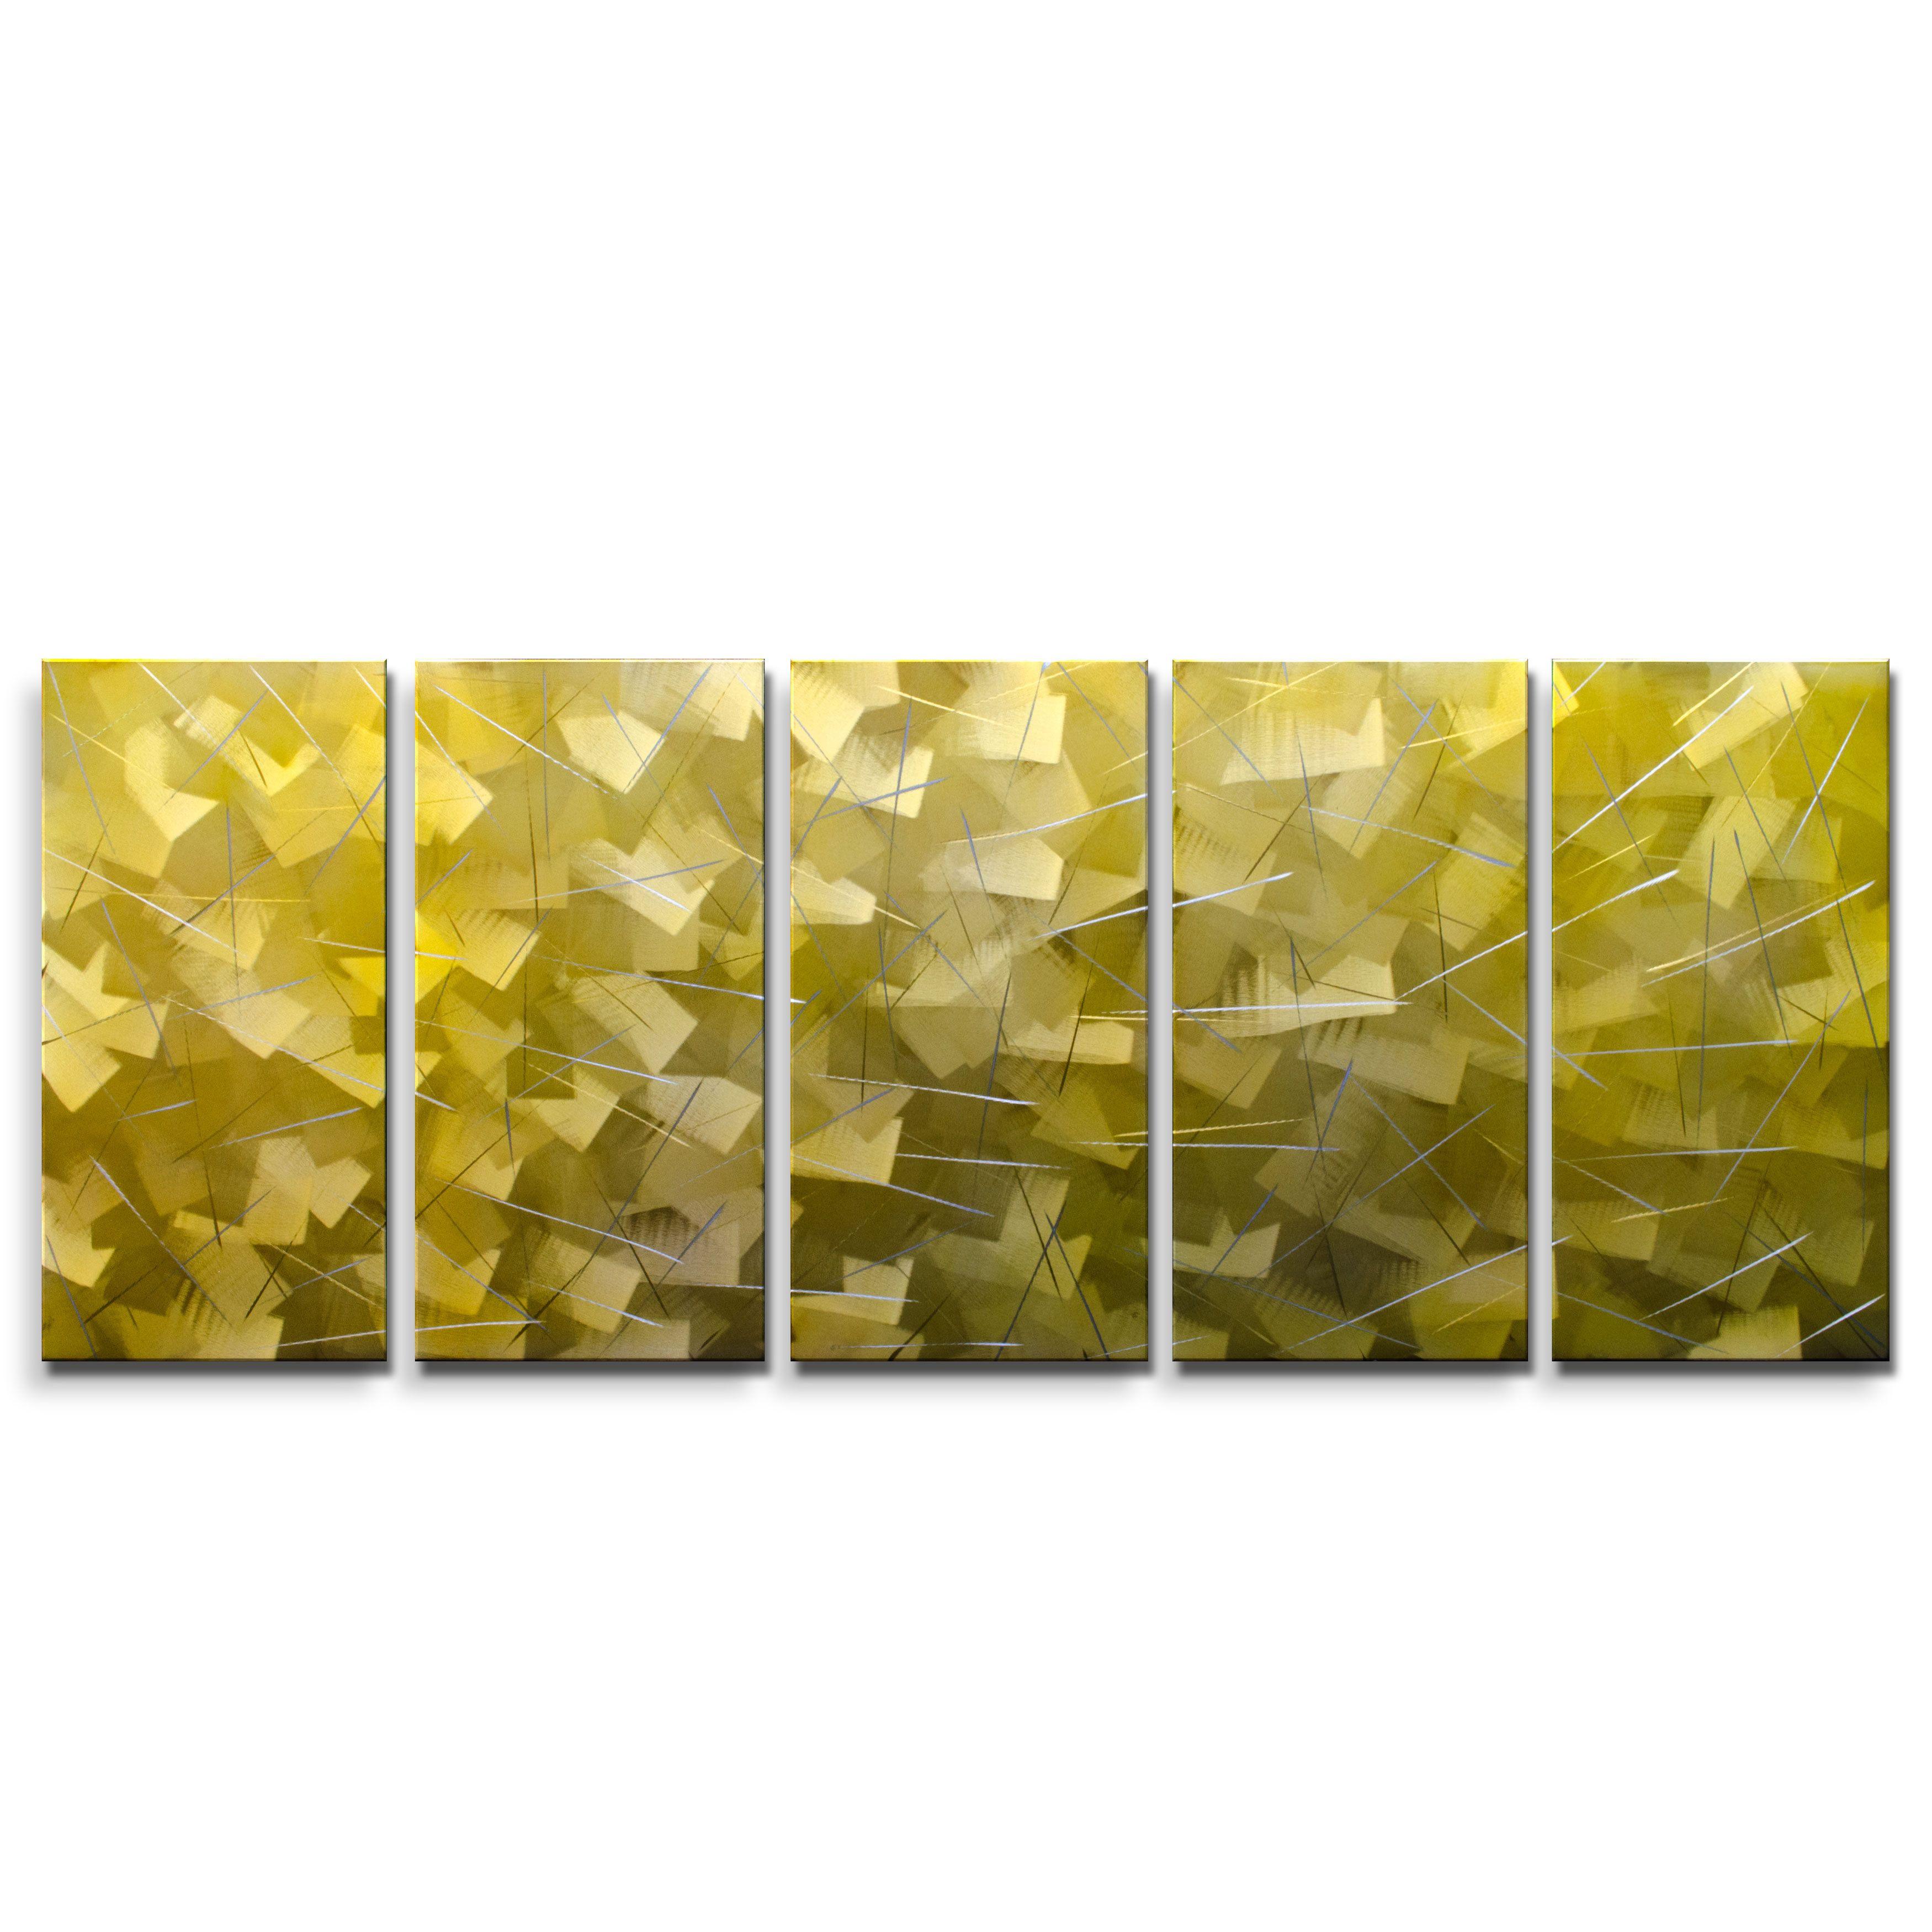 Nirvana\' Metal Wall Art 24 x 59-inch | Products | Pinterest | Metal ...